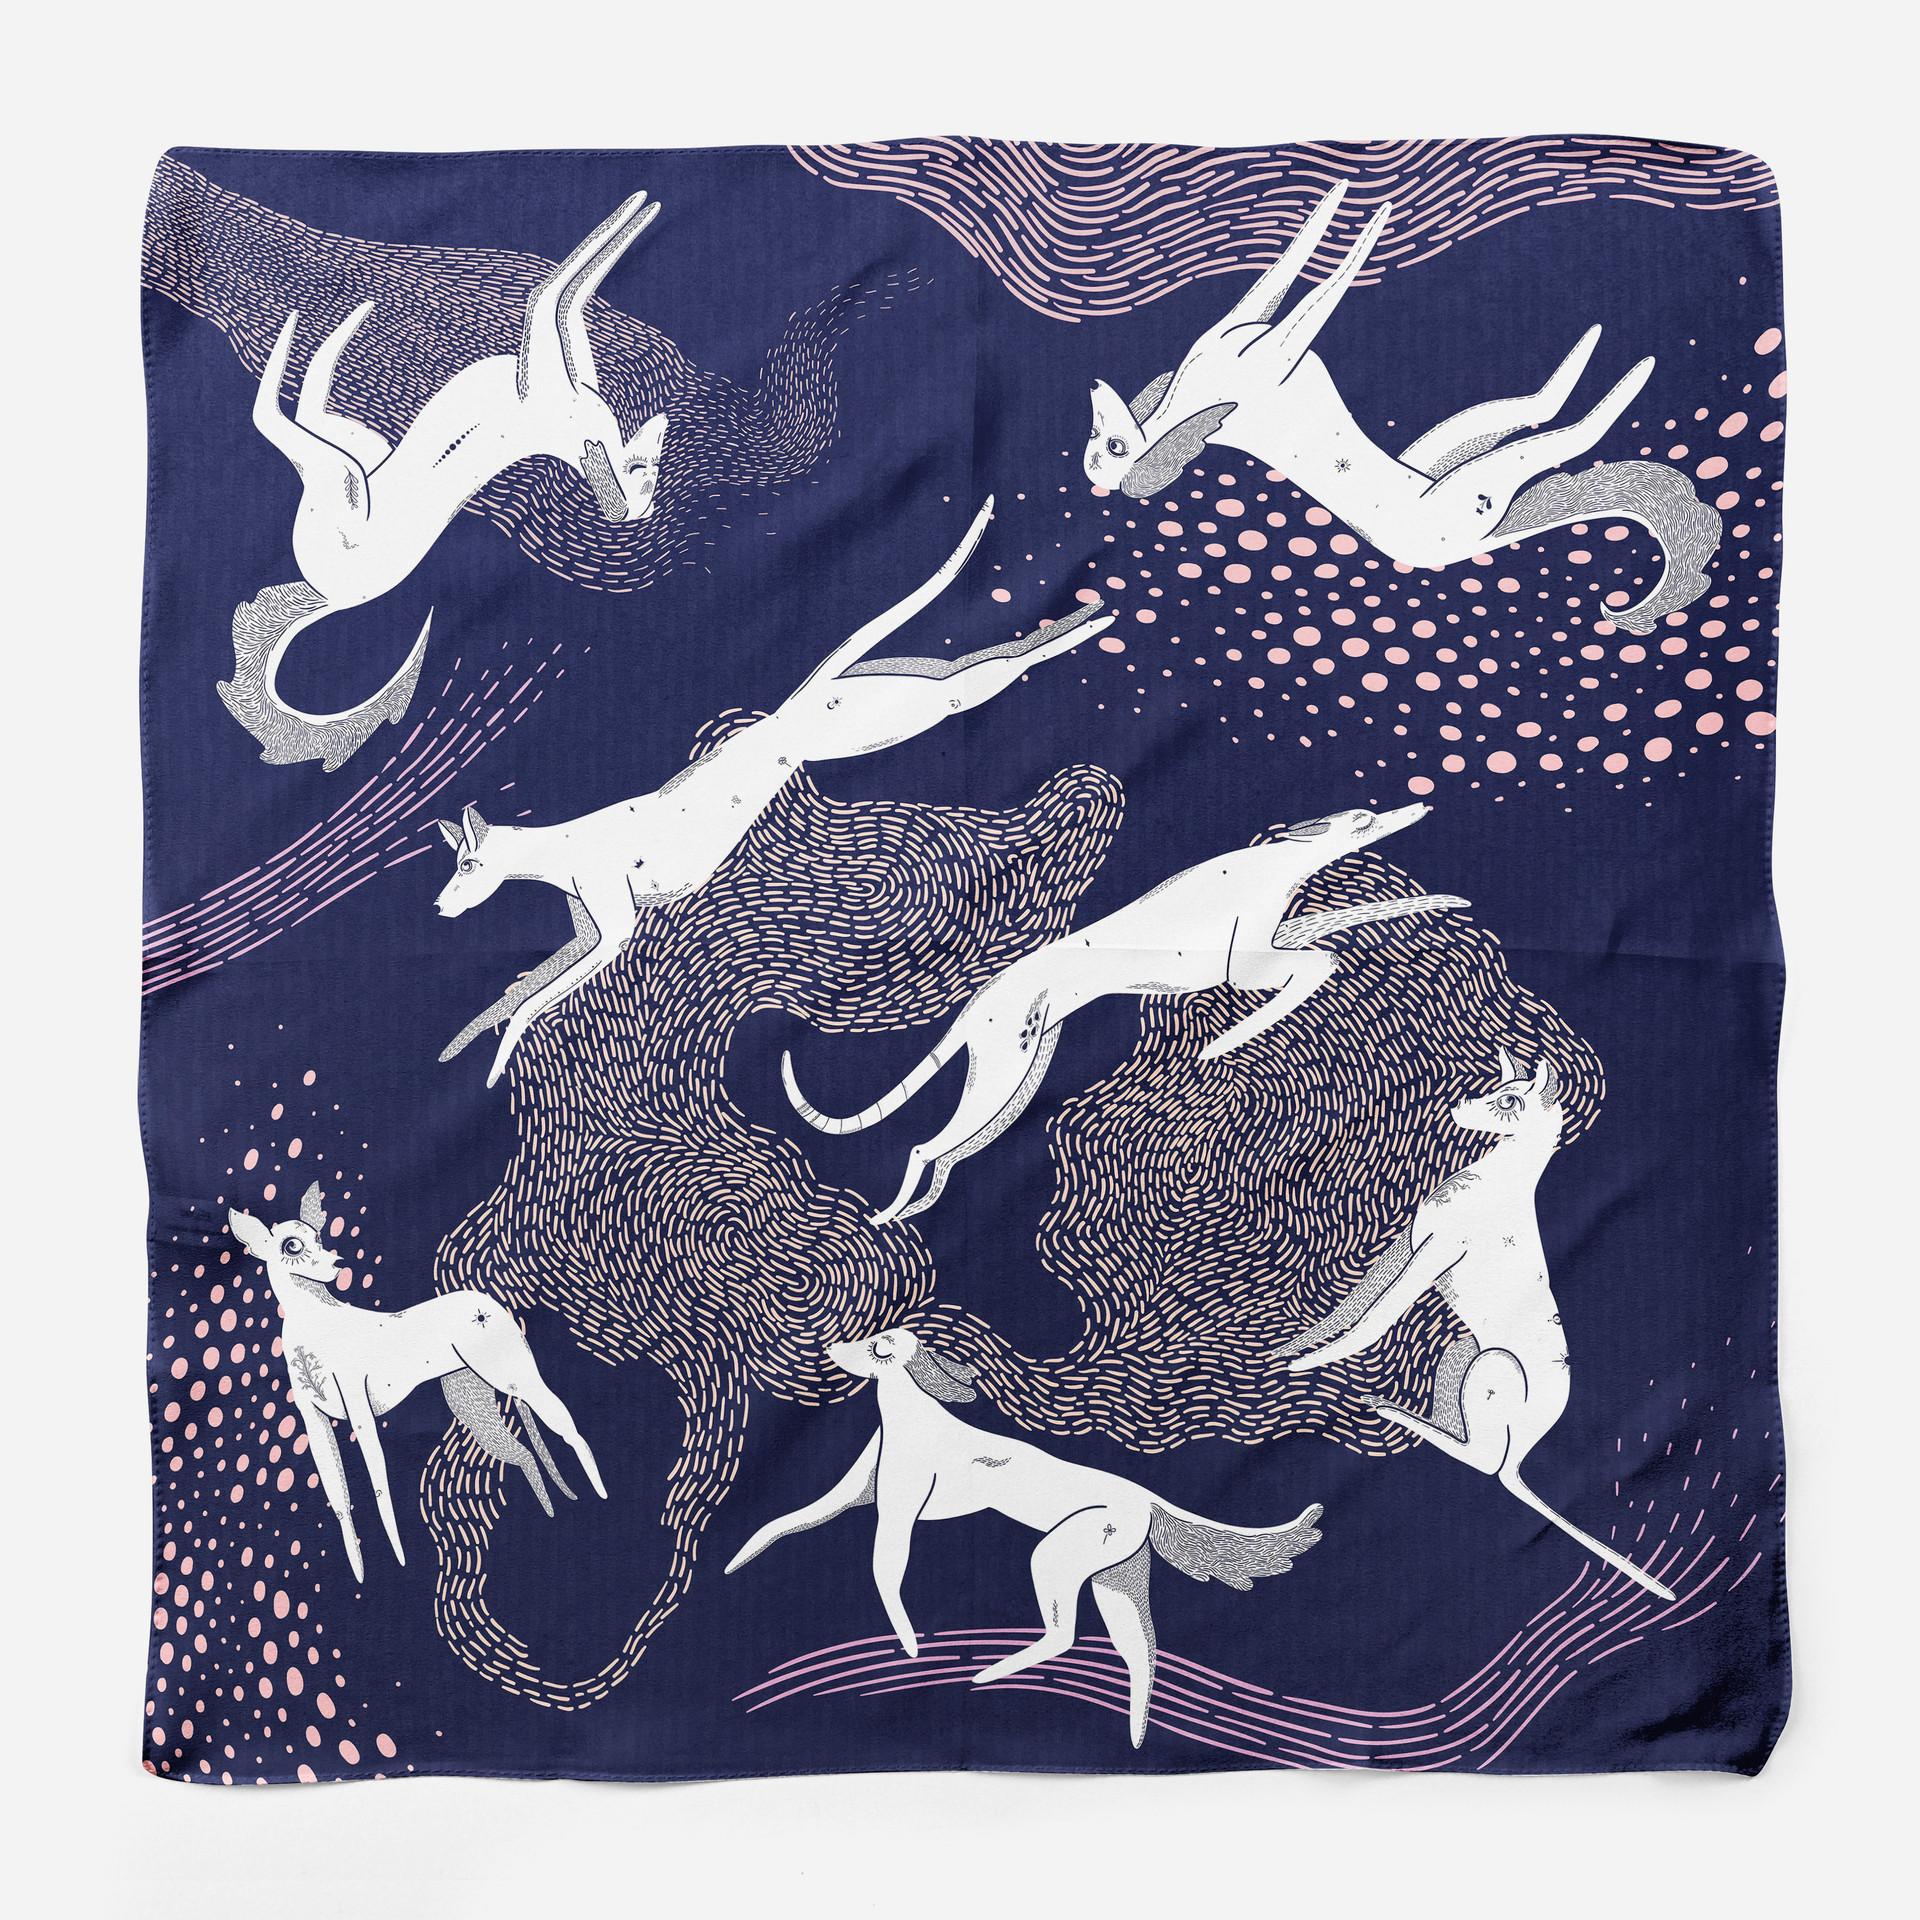 spirit dogs scarf 3.jpg